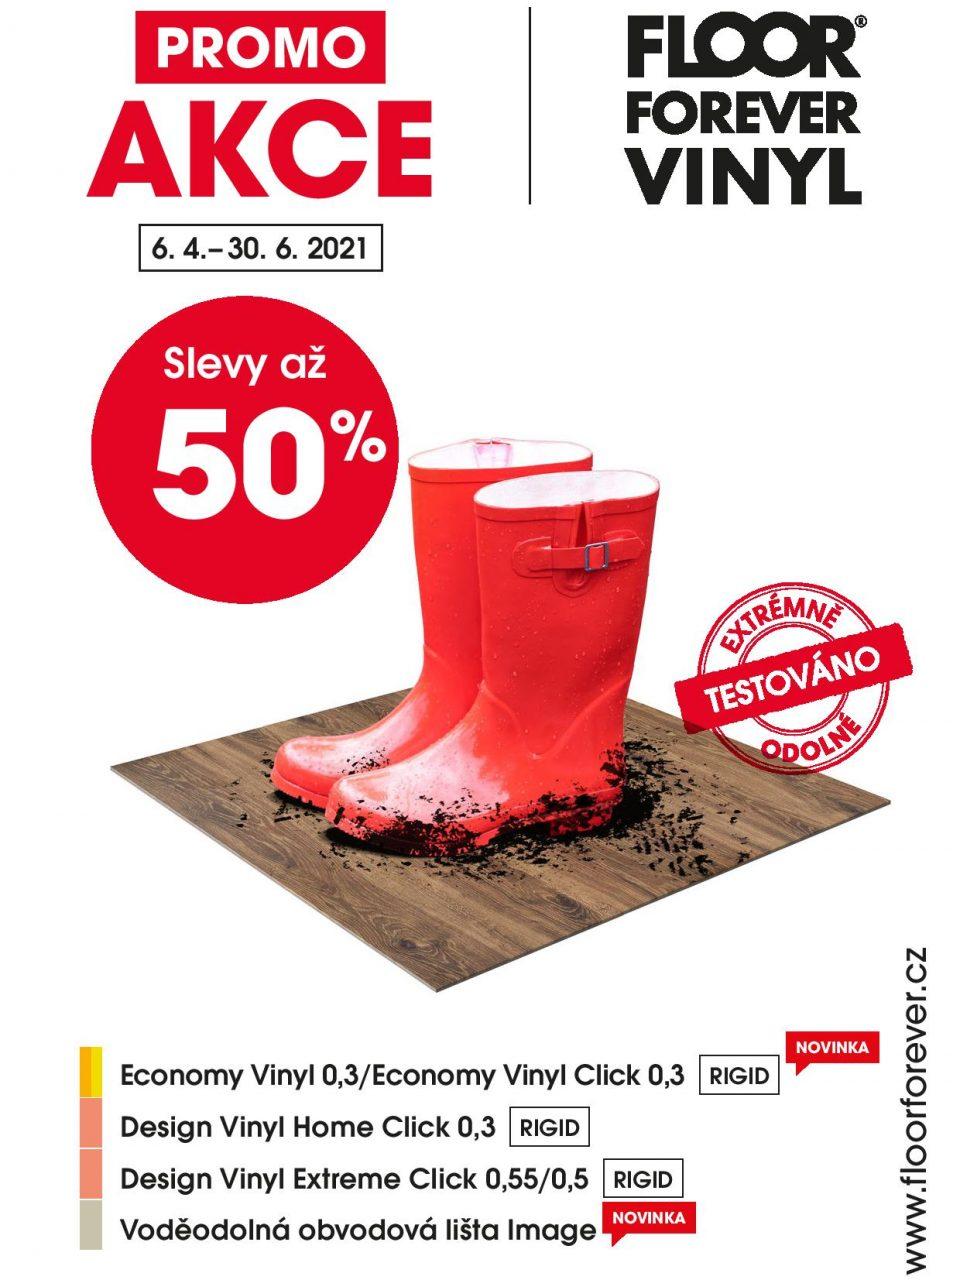 FF-vinyl-letak-promo-8xA4-2021-02-online-page-001